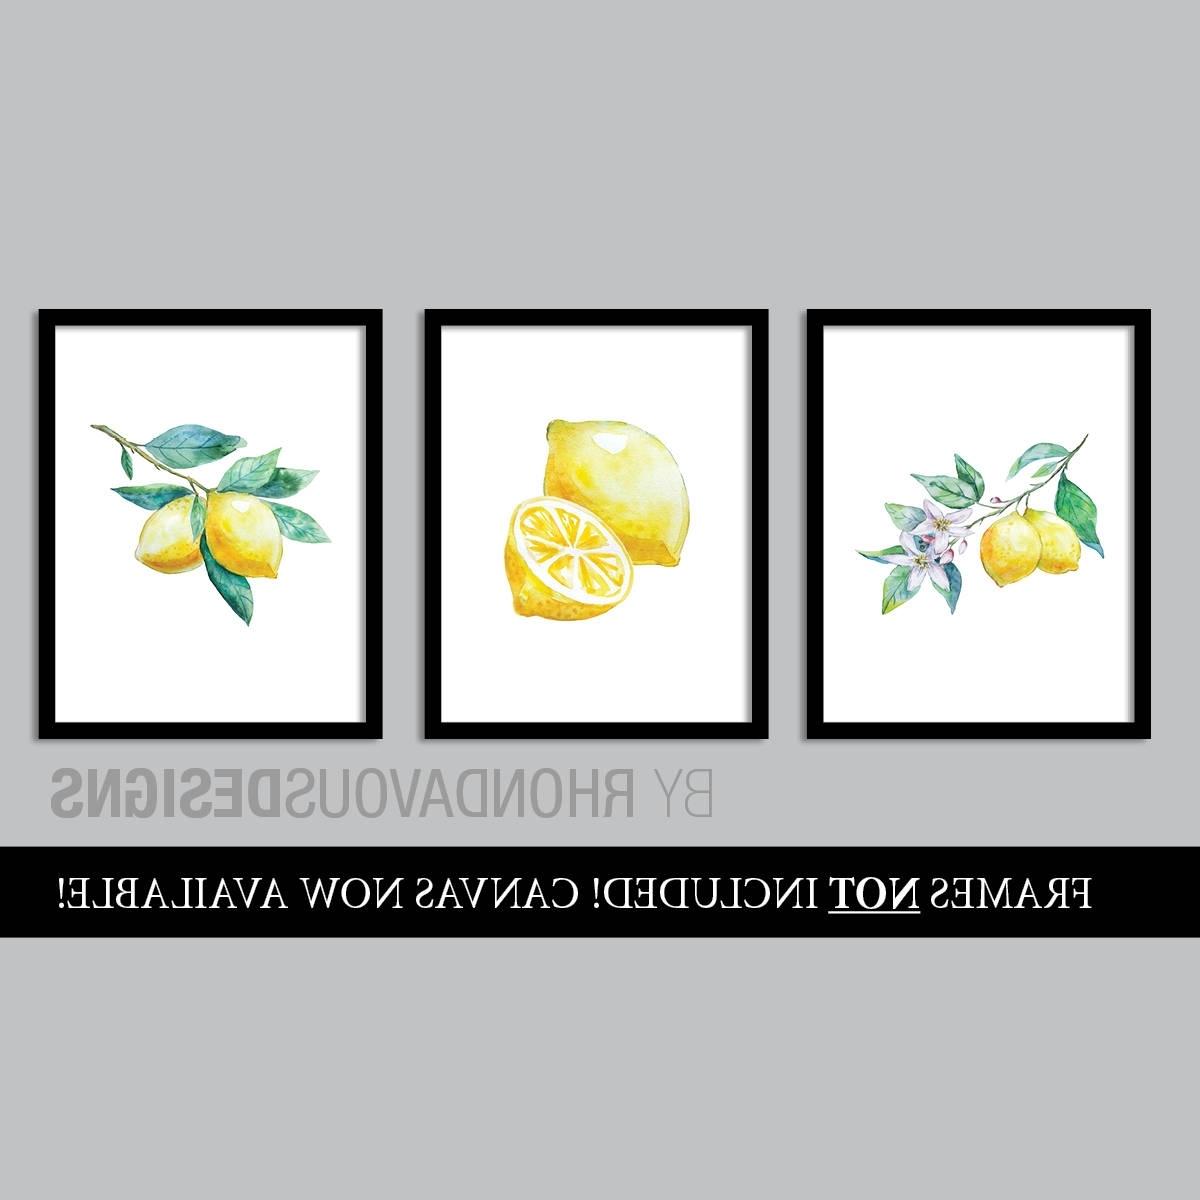 Watercolor Lemon Art Prints. French Country Decor (View 12 of 15)